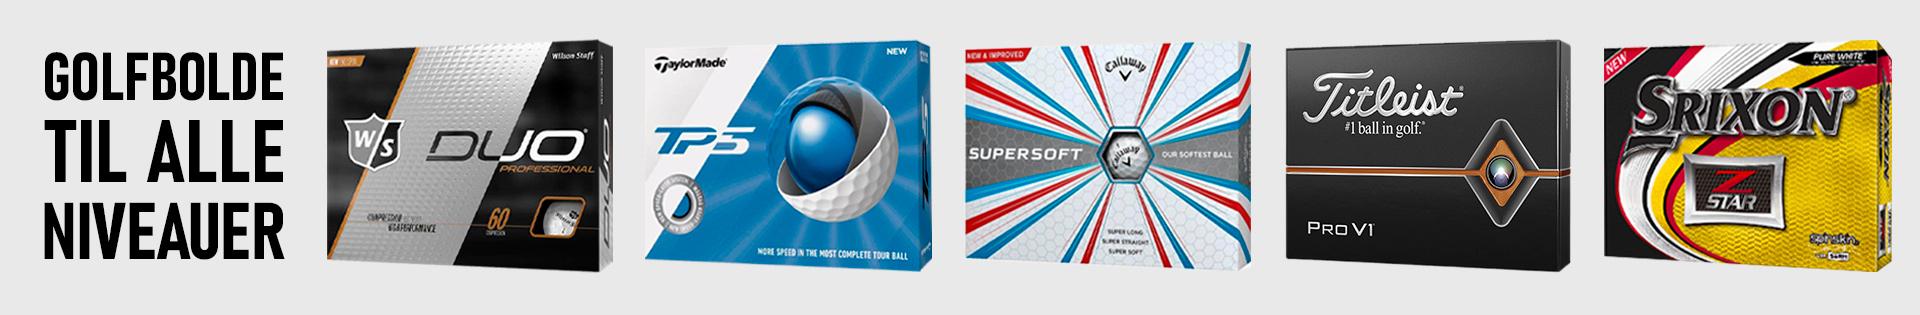 Nye golfbolde